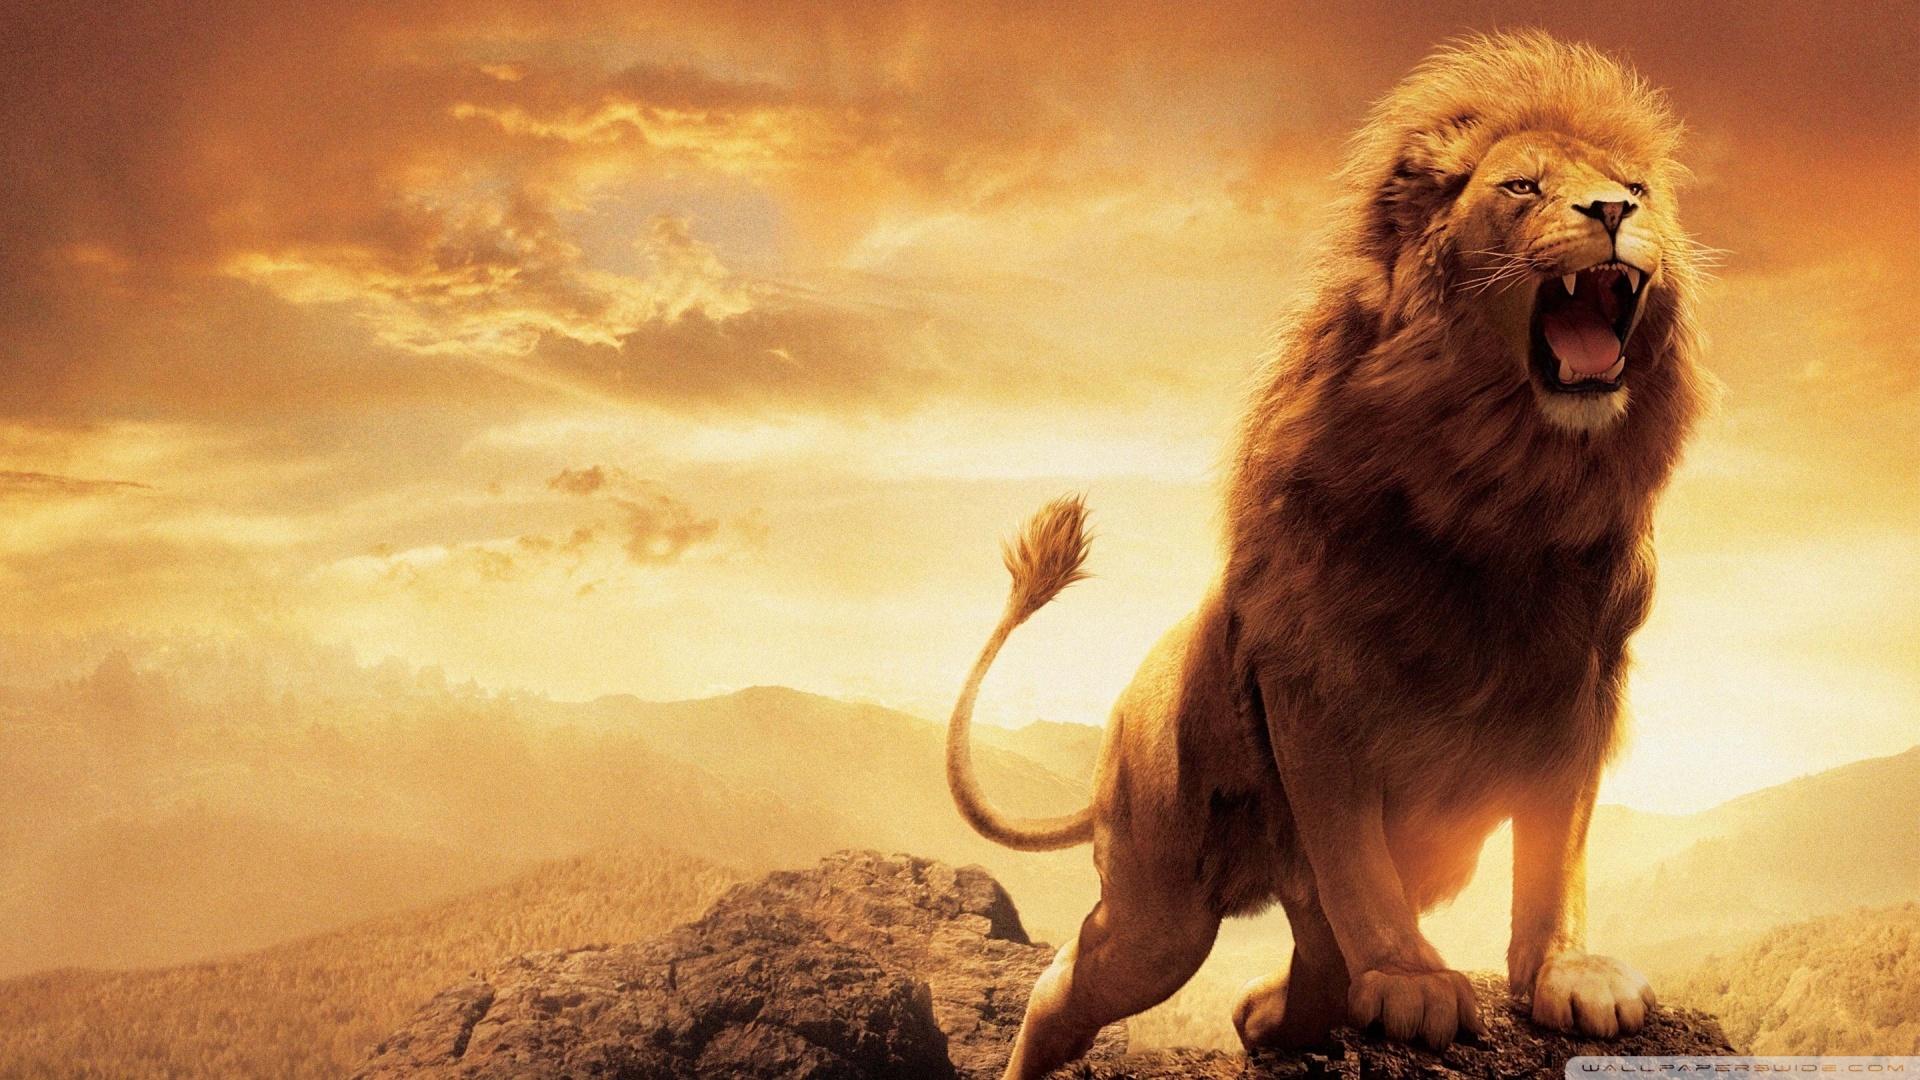 Hd 16 Hd Wallpapers 1080p Lion 2131092 Hd Wallpaper